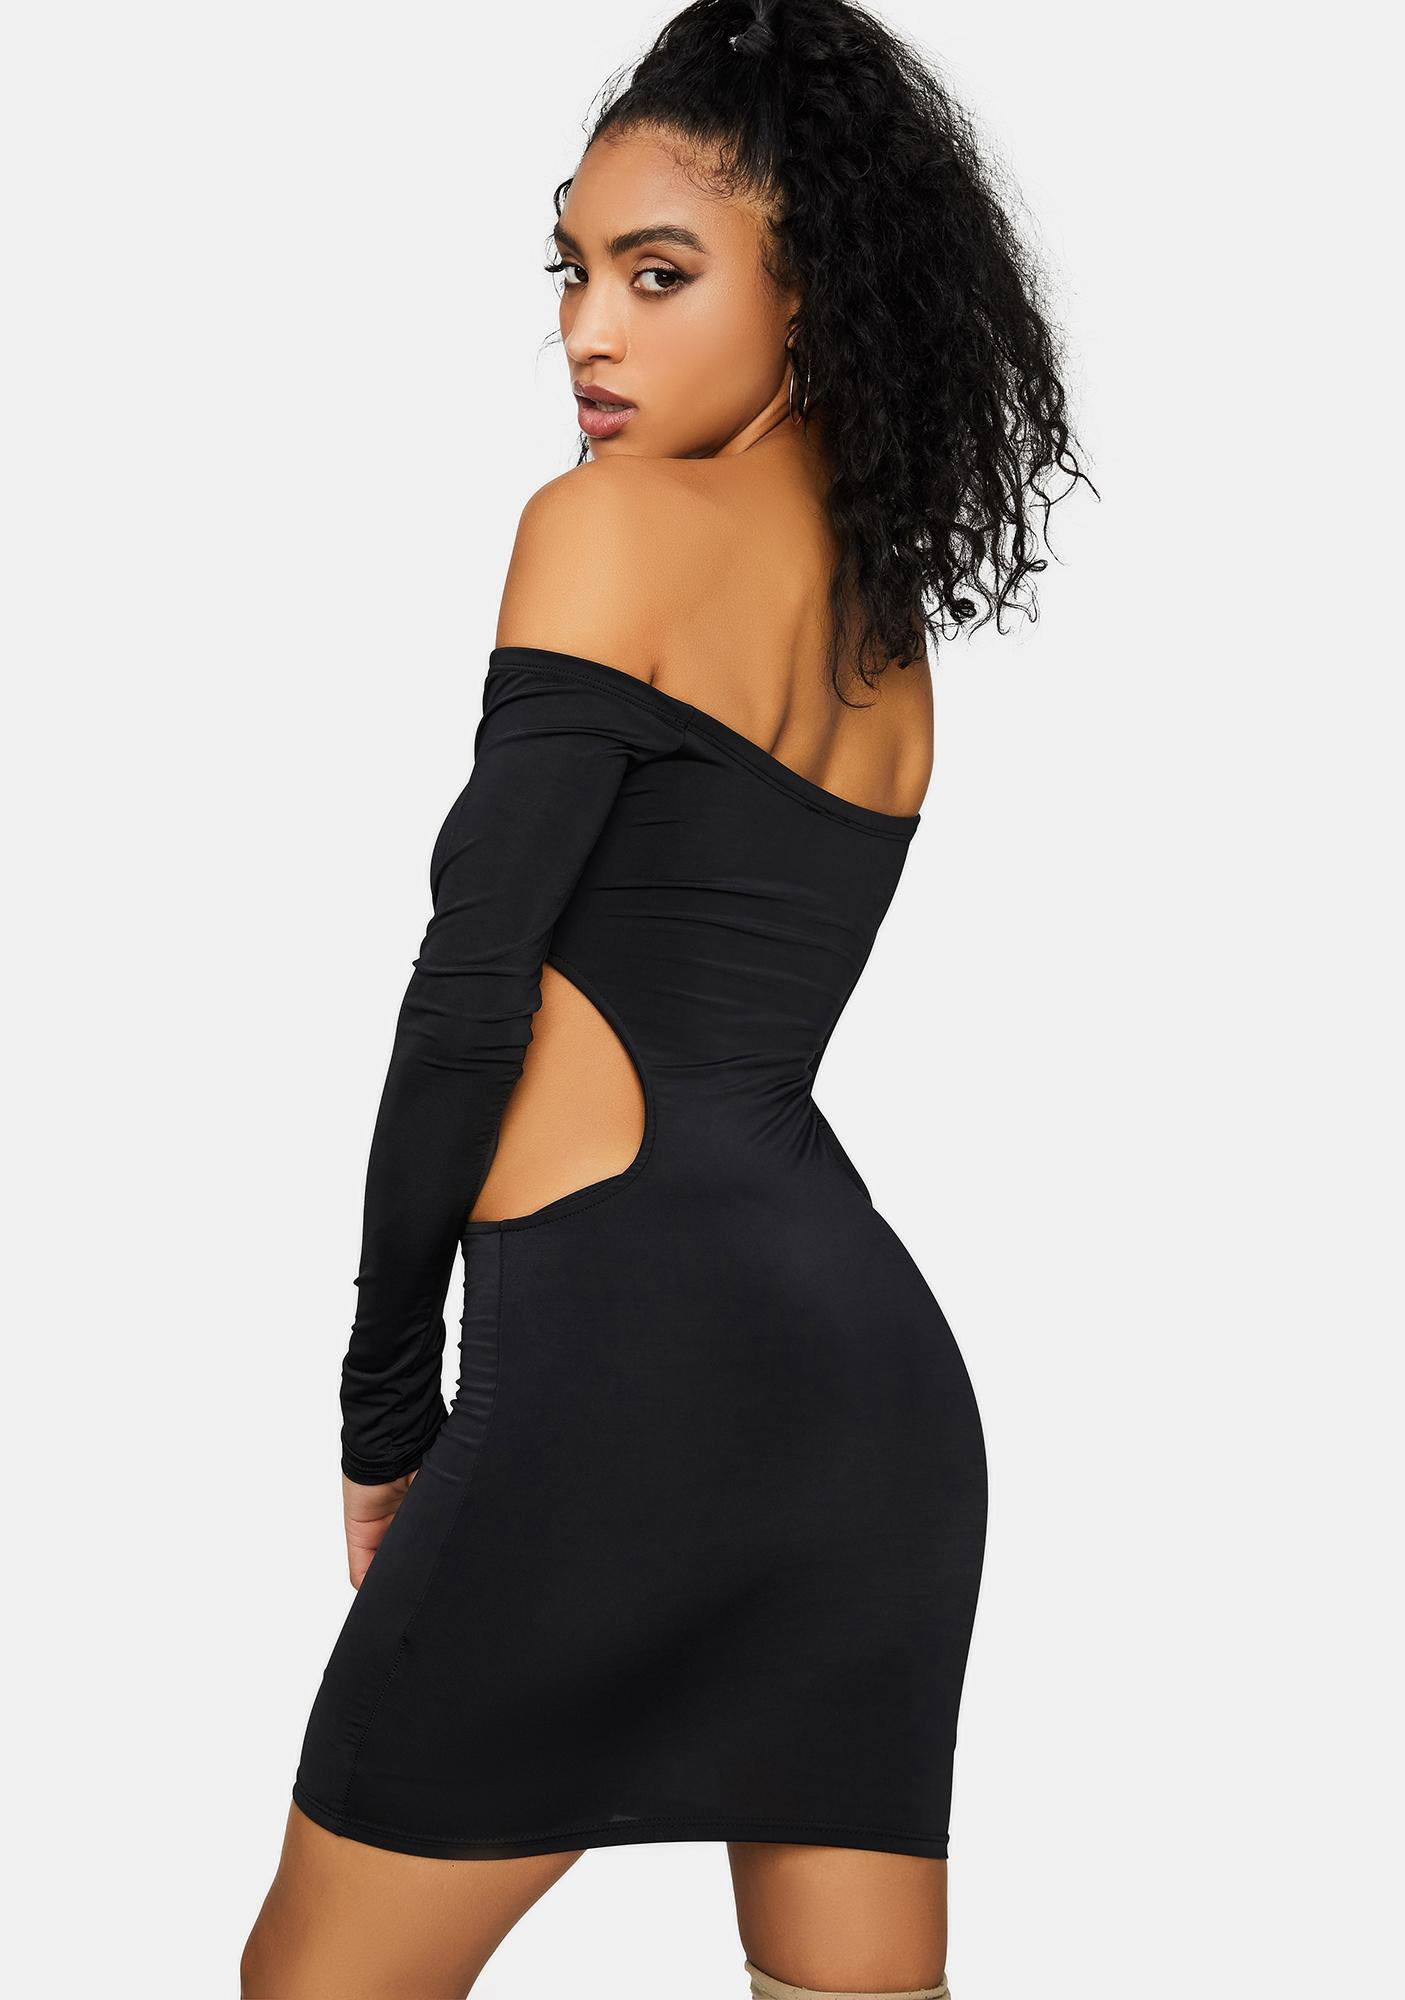 Secretly My Favorite Cutout Mini Dress